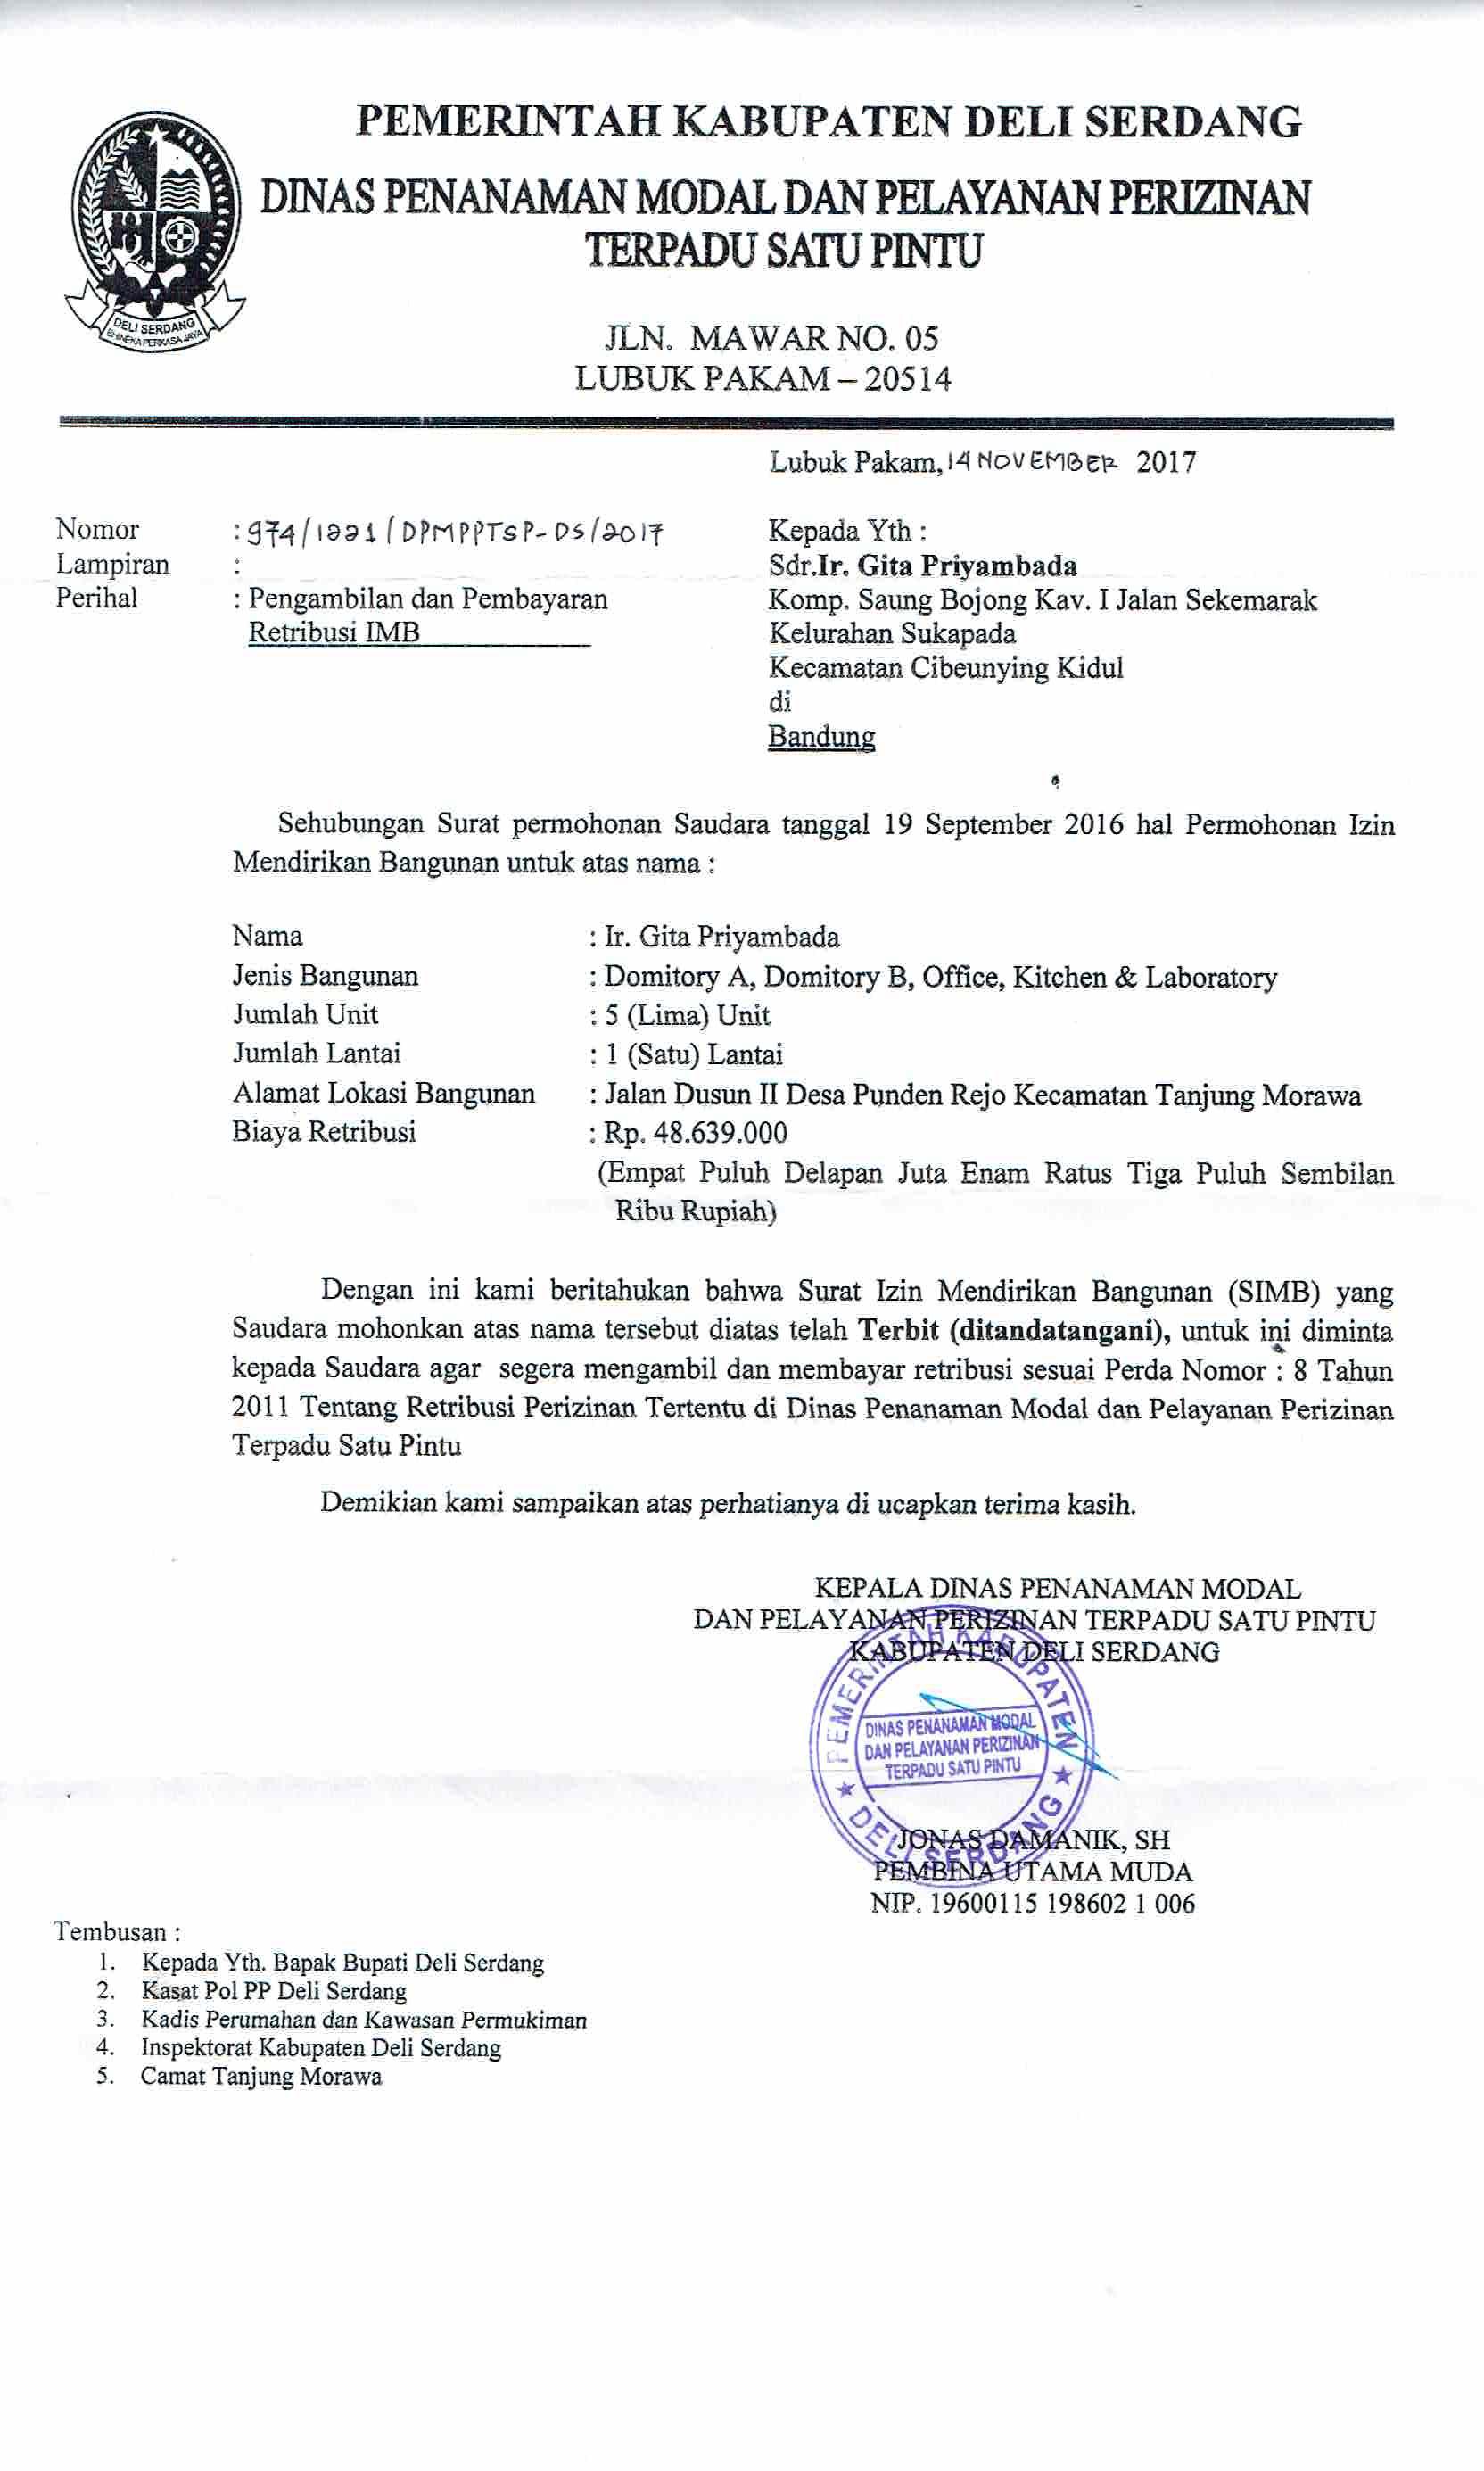 J And J Deli >> Seri Deli Sistem Elektronik Perizinan Deli Serdang 08